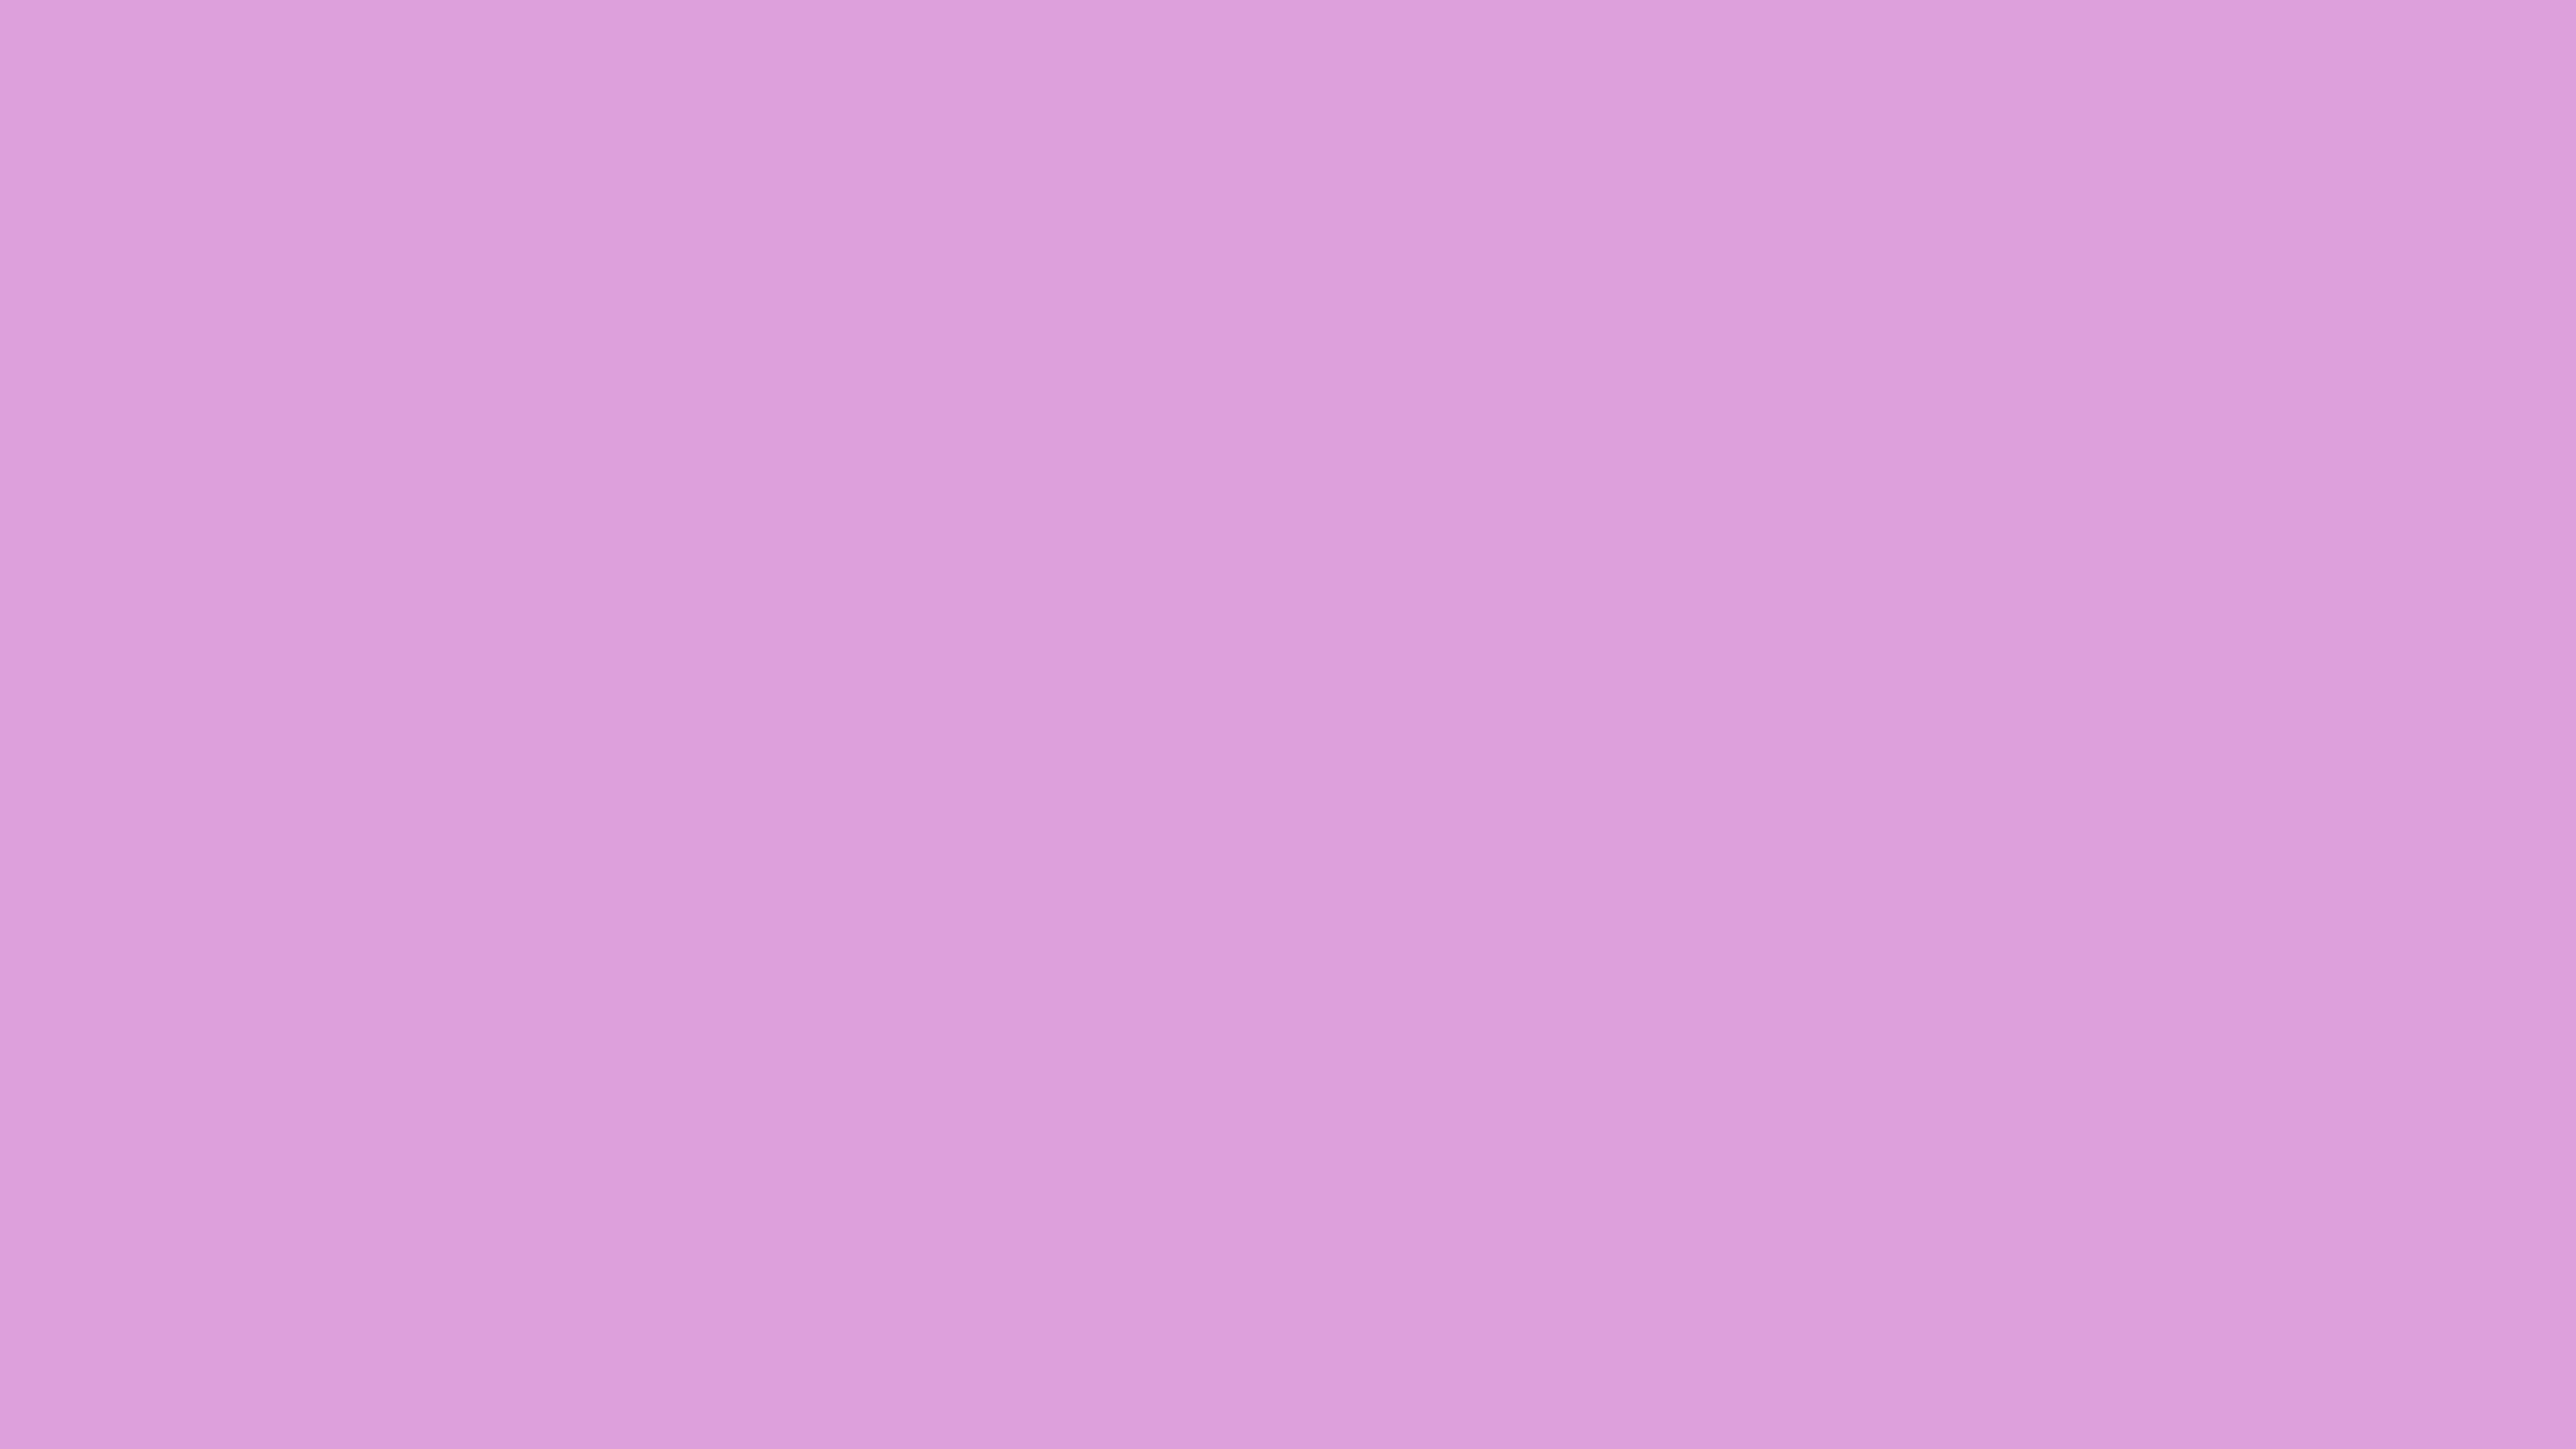 4096x2304 Plum Web Solid Color Background